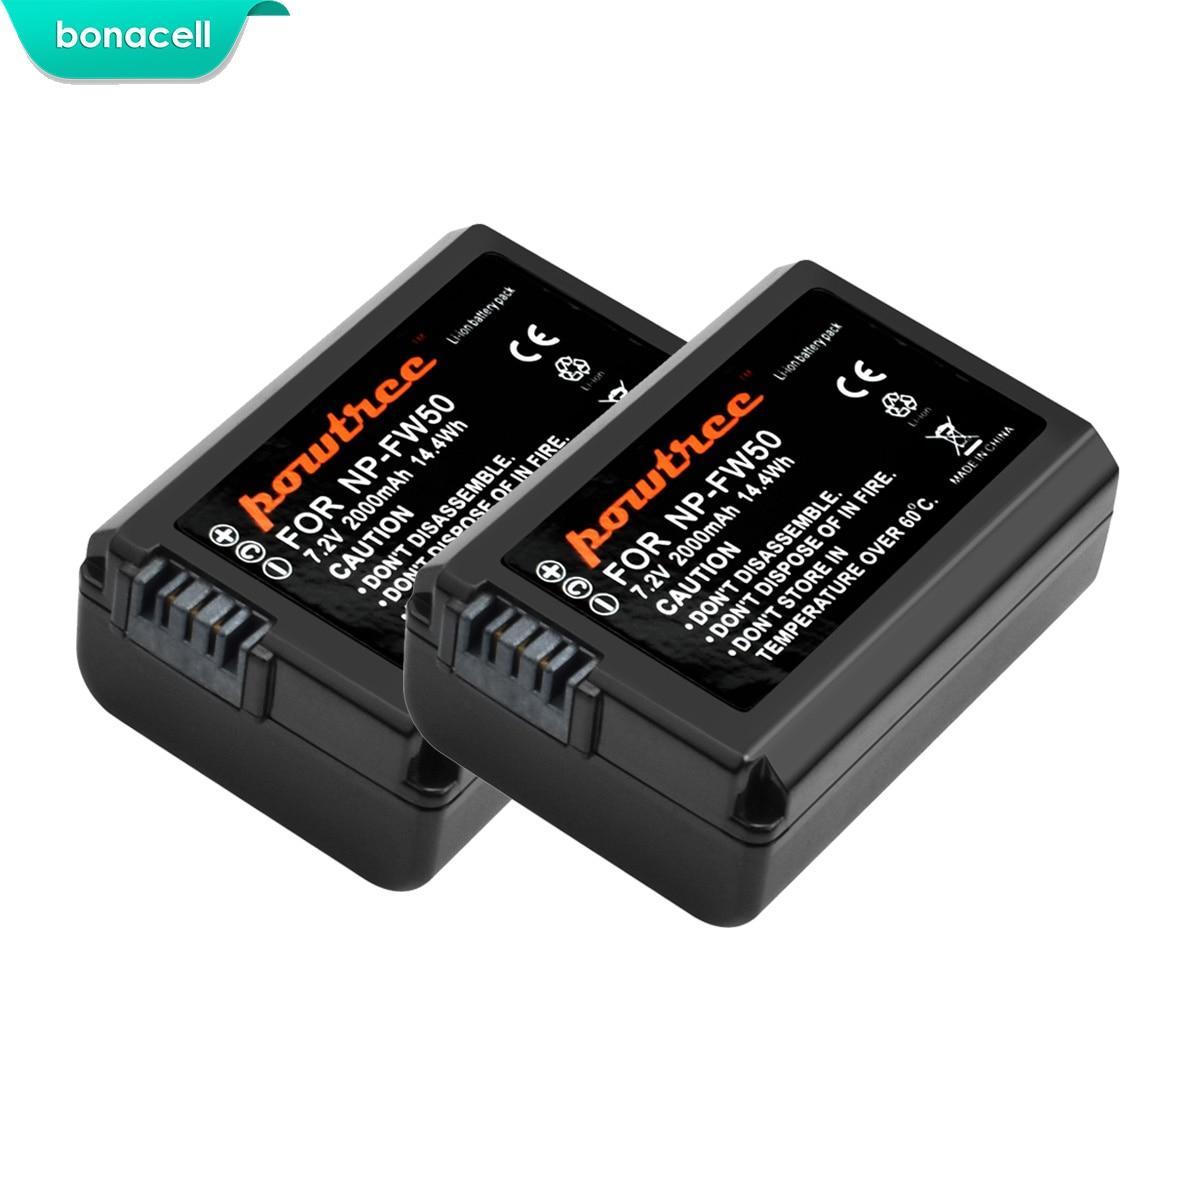 Bonacell 2000mah NP-FW50 NP FW50 Battery AKKU For Sony NEX-7 NEX-5N NEX-5R NEX-F3 NEX-3D Alpha a5000 a6000 DSC-RX10 Alpha 7 a7II